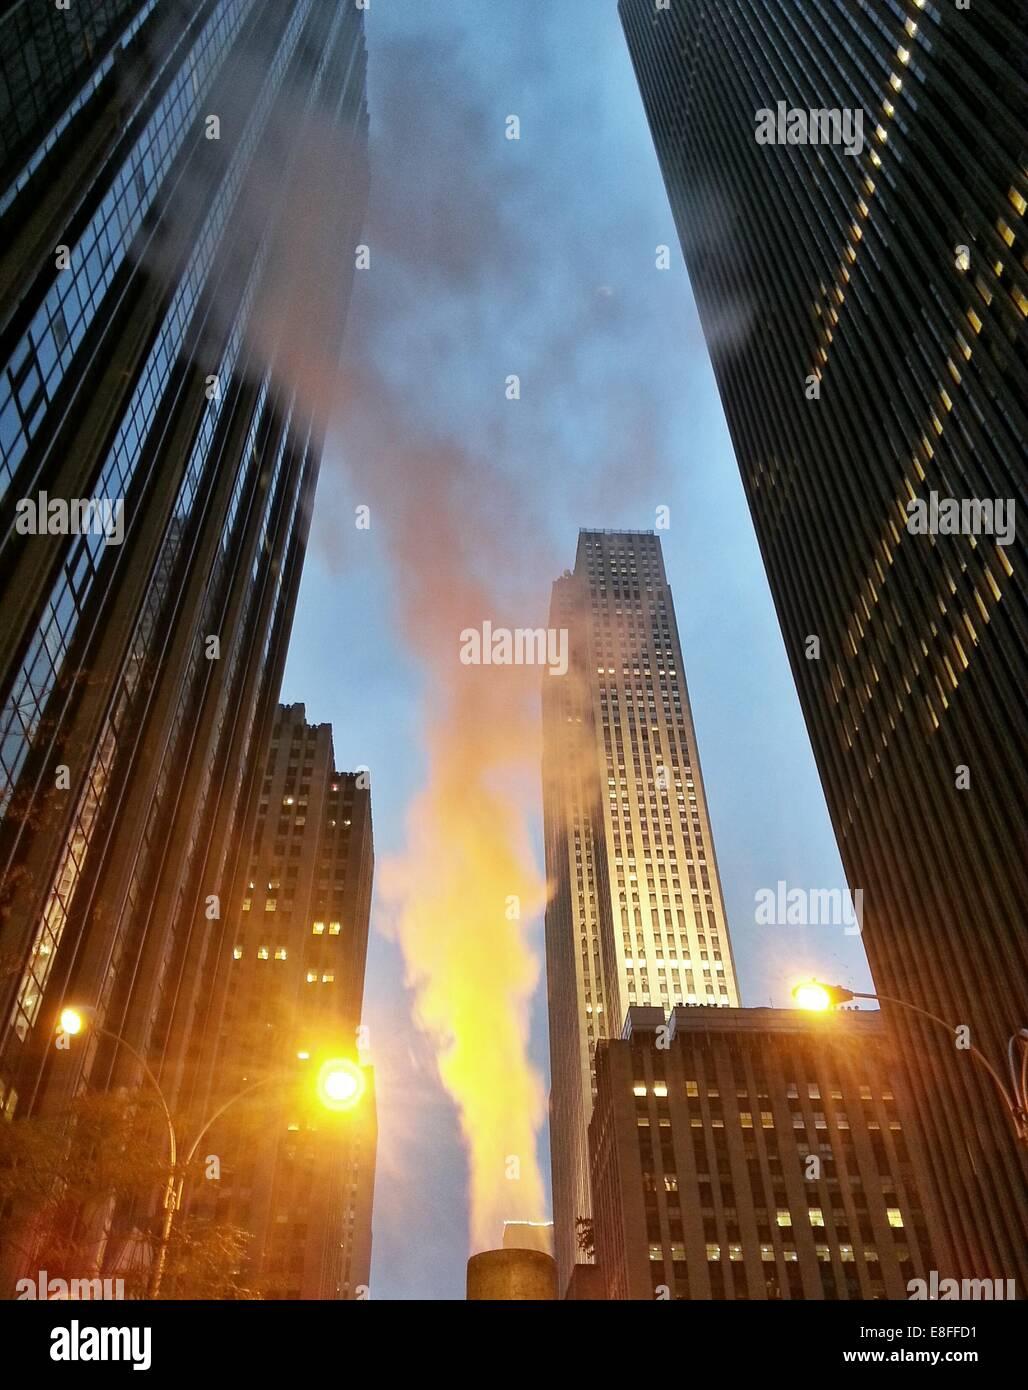 USA, New York State, New York City, Dampf steigt am Rockefeller Center Stockbild